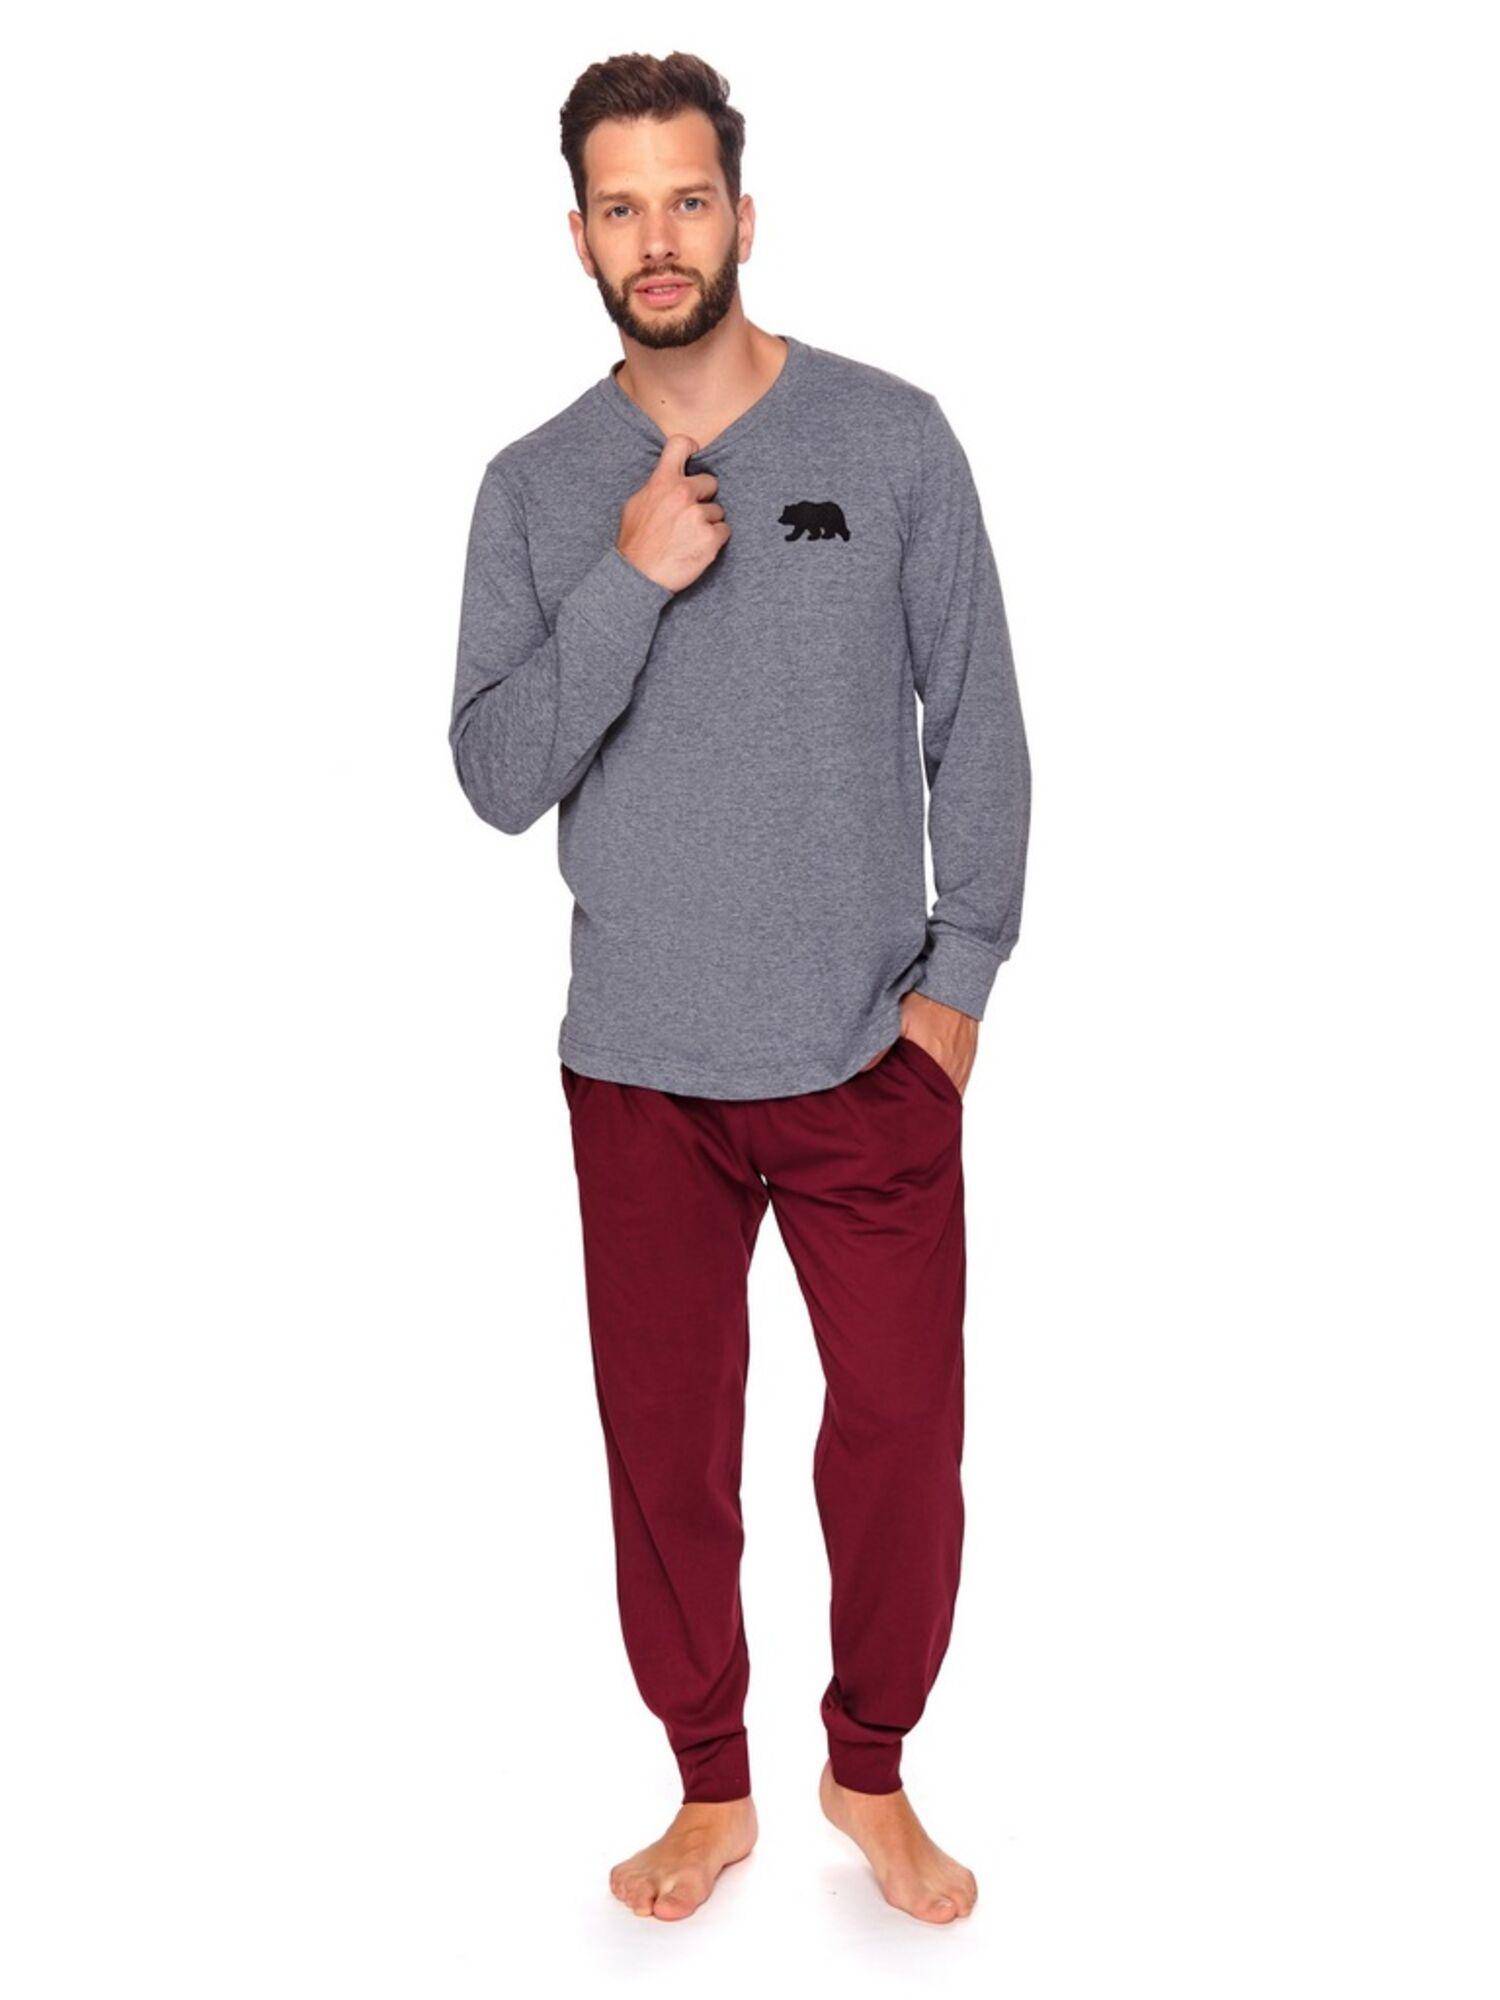 Пижама мужская со штанами 9509 PMB, серый, DOCTOR NAP